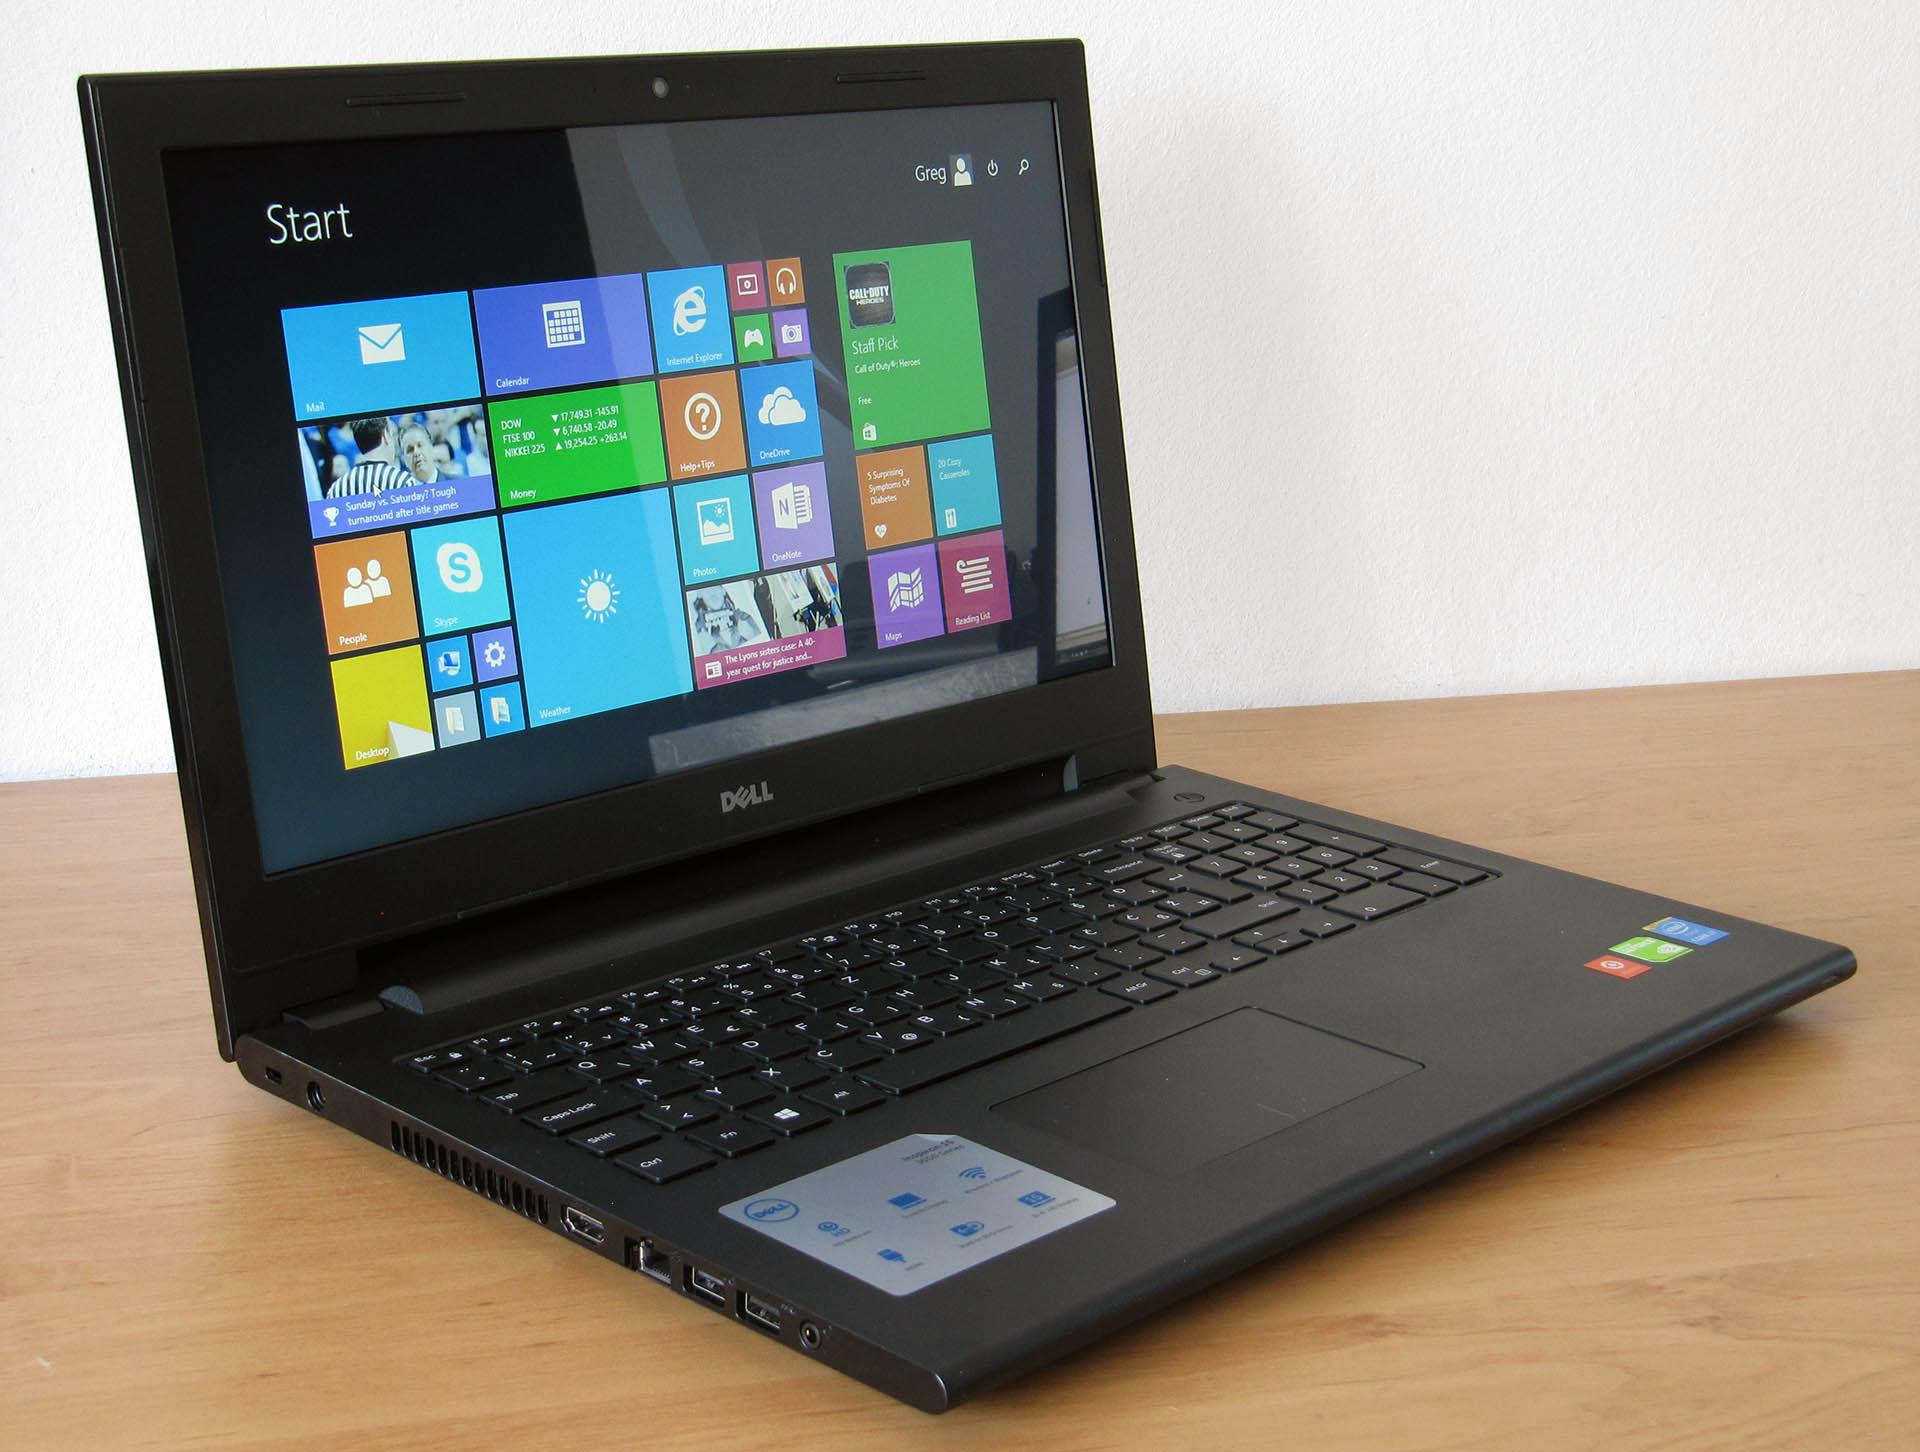 Dell Inspiron 3543 – i7 Broadwell-U inside